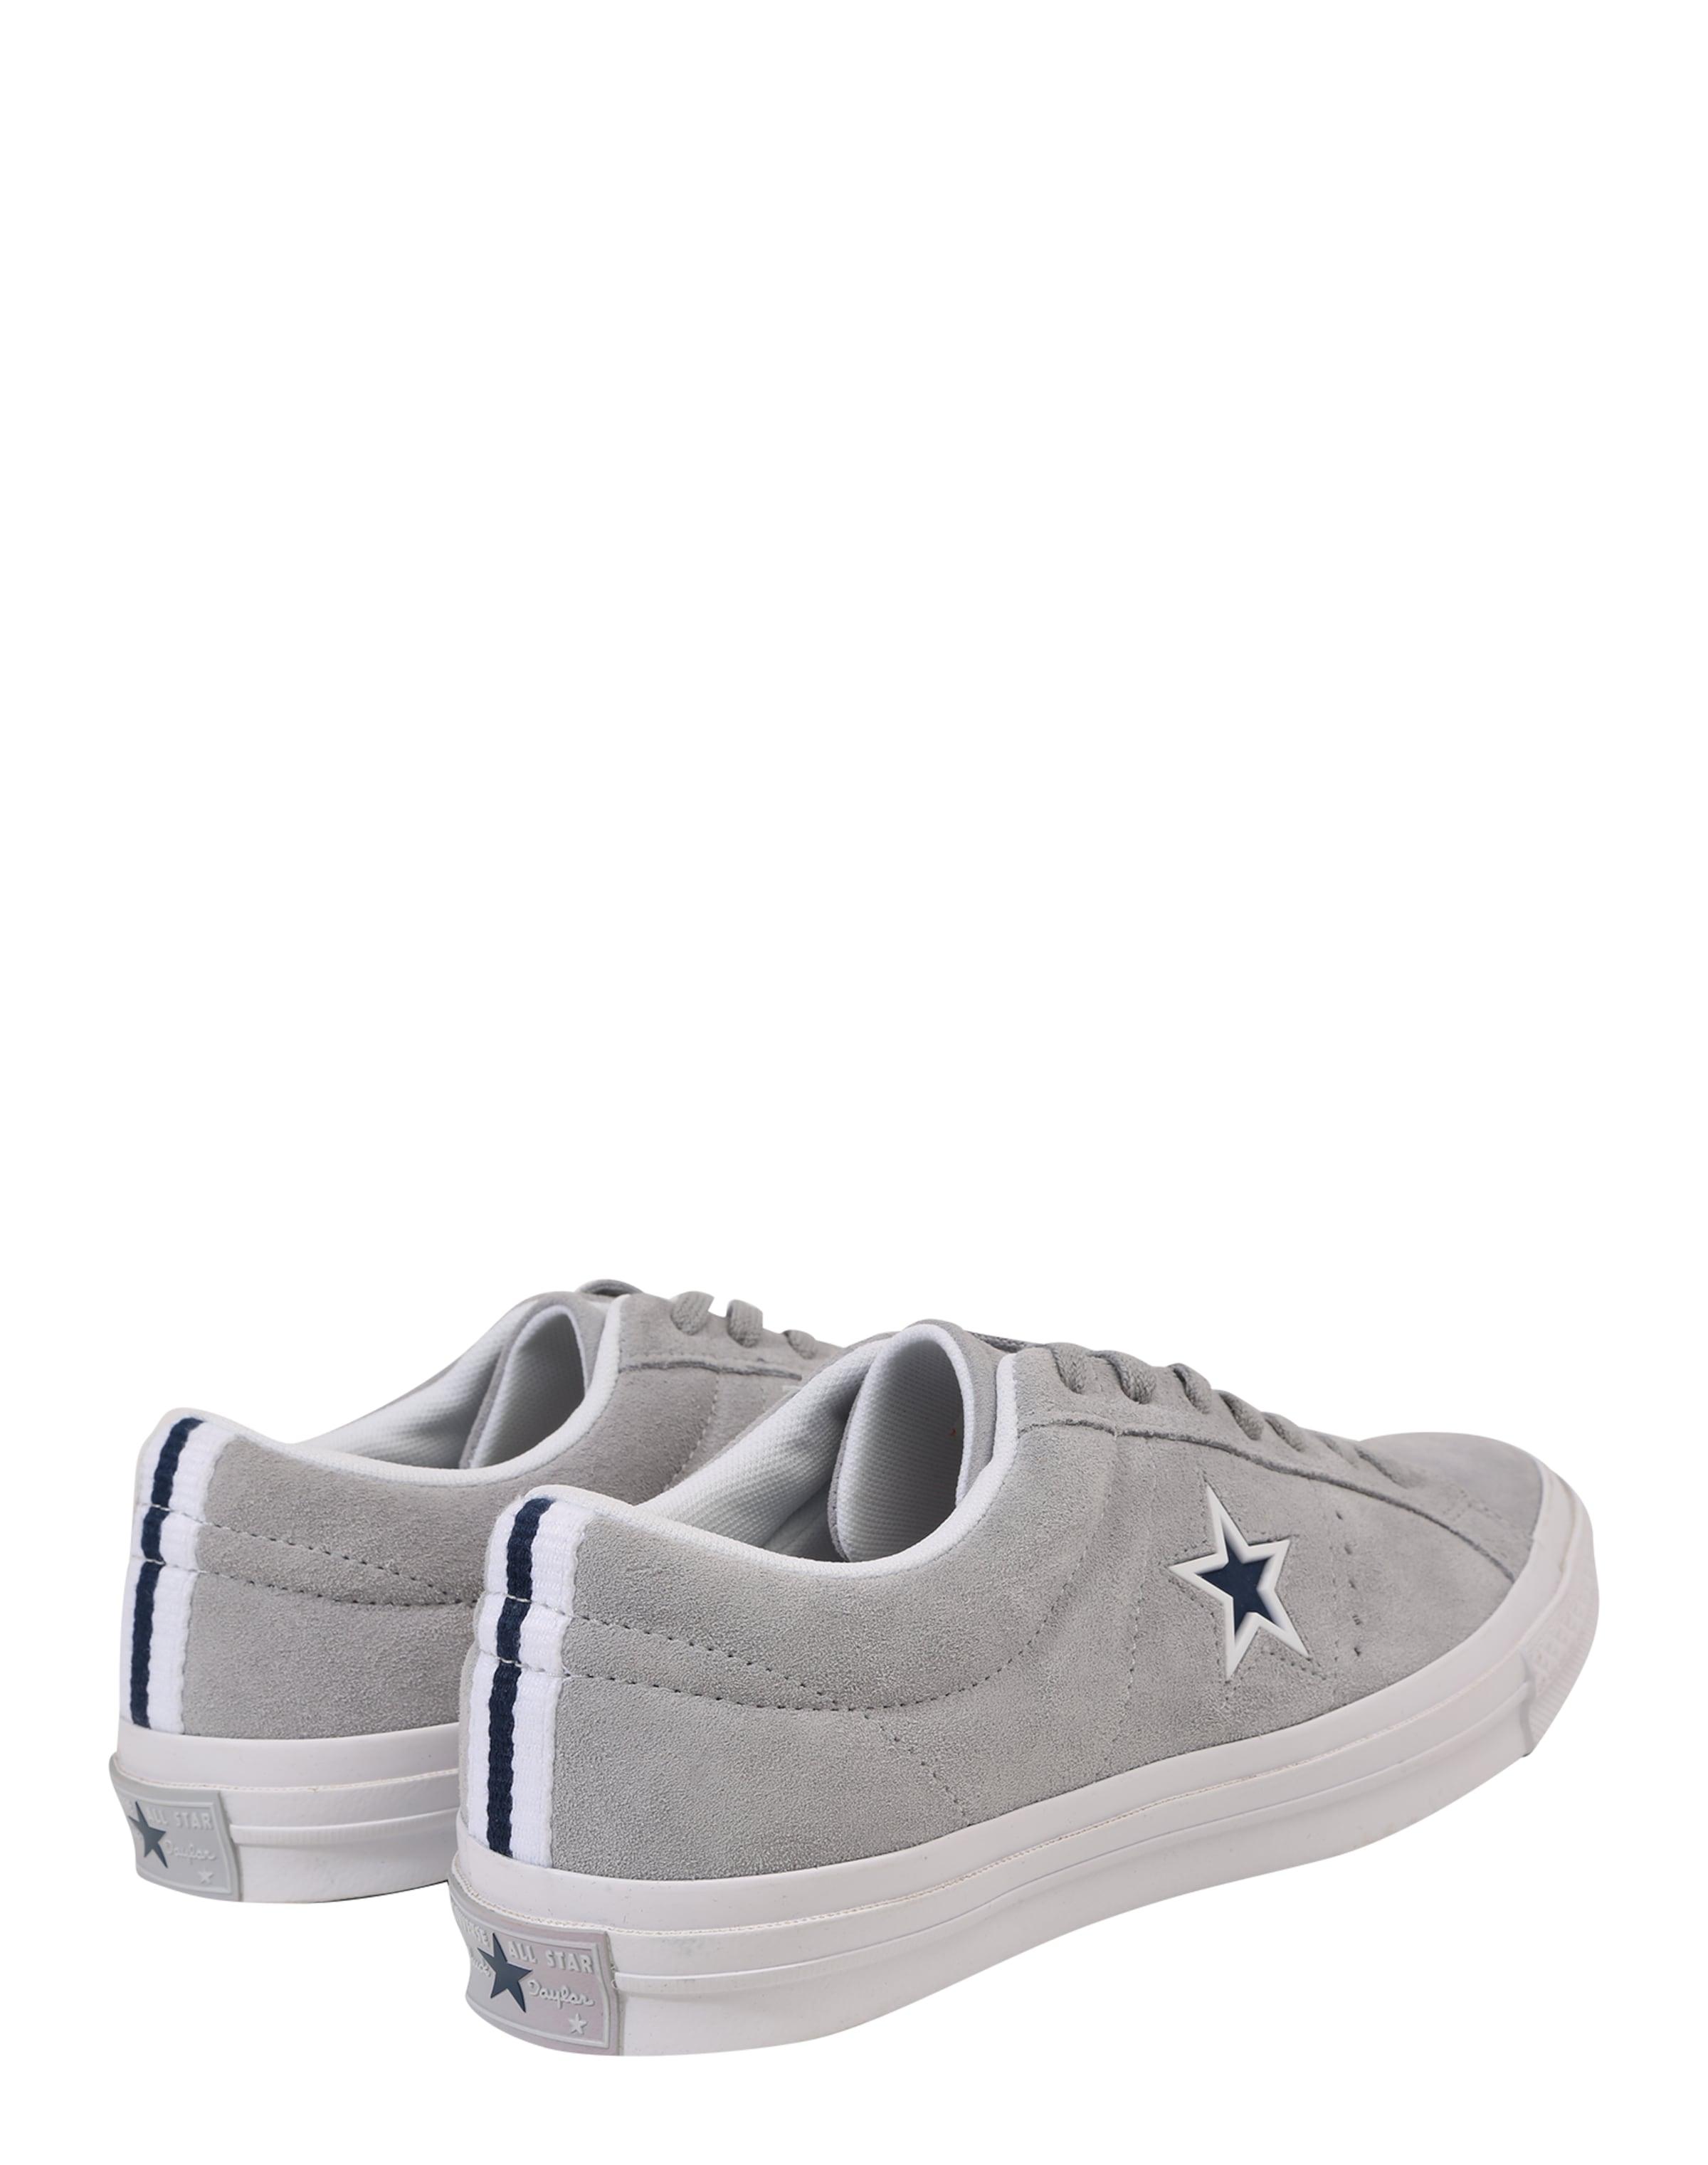 Converse Ox' Laag 'one Grijs Sneakers In Star rISZPrwq